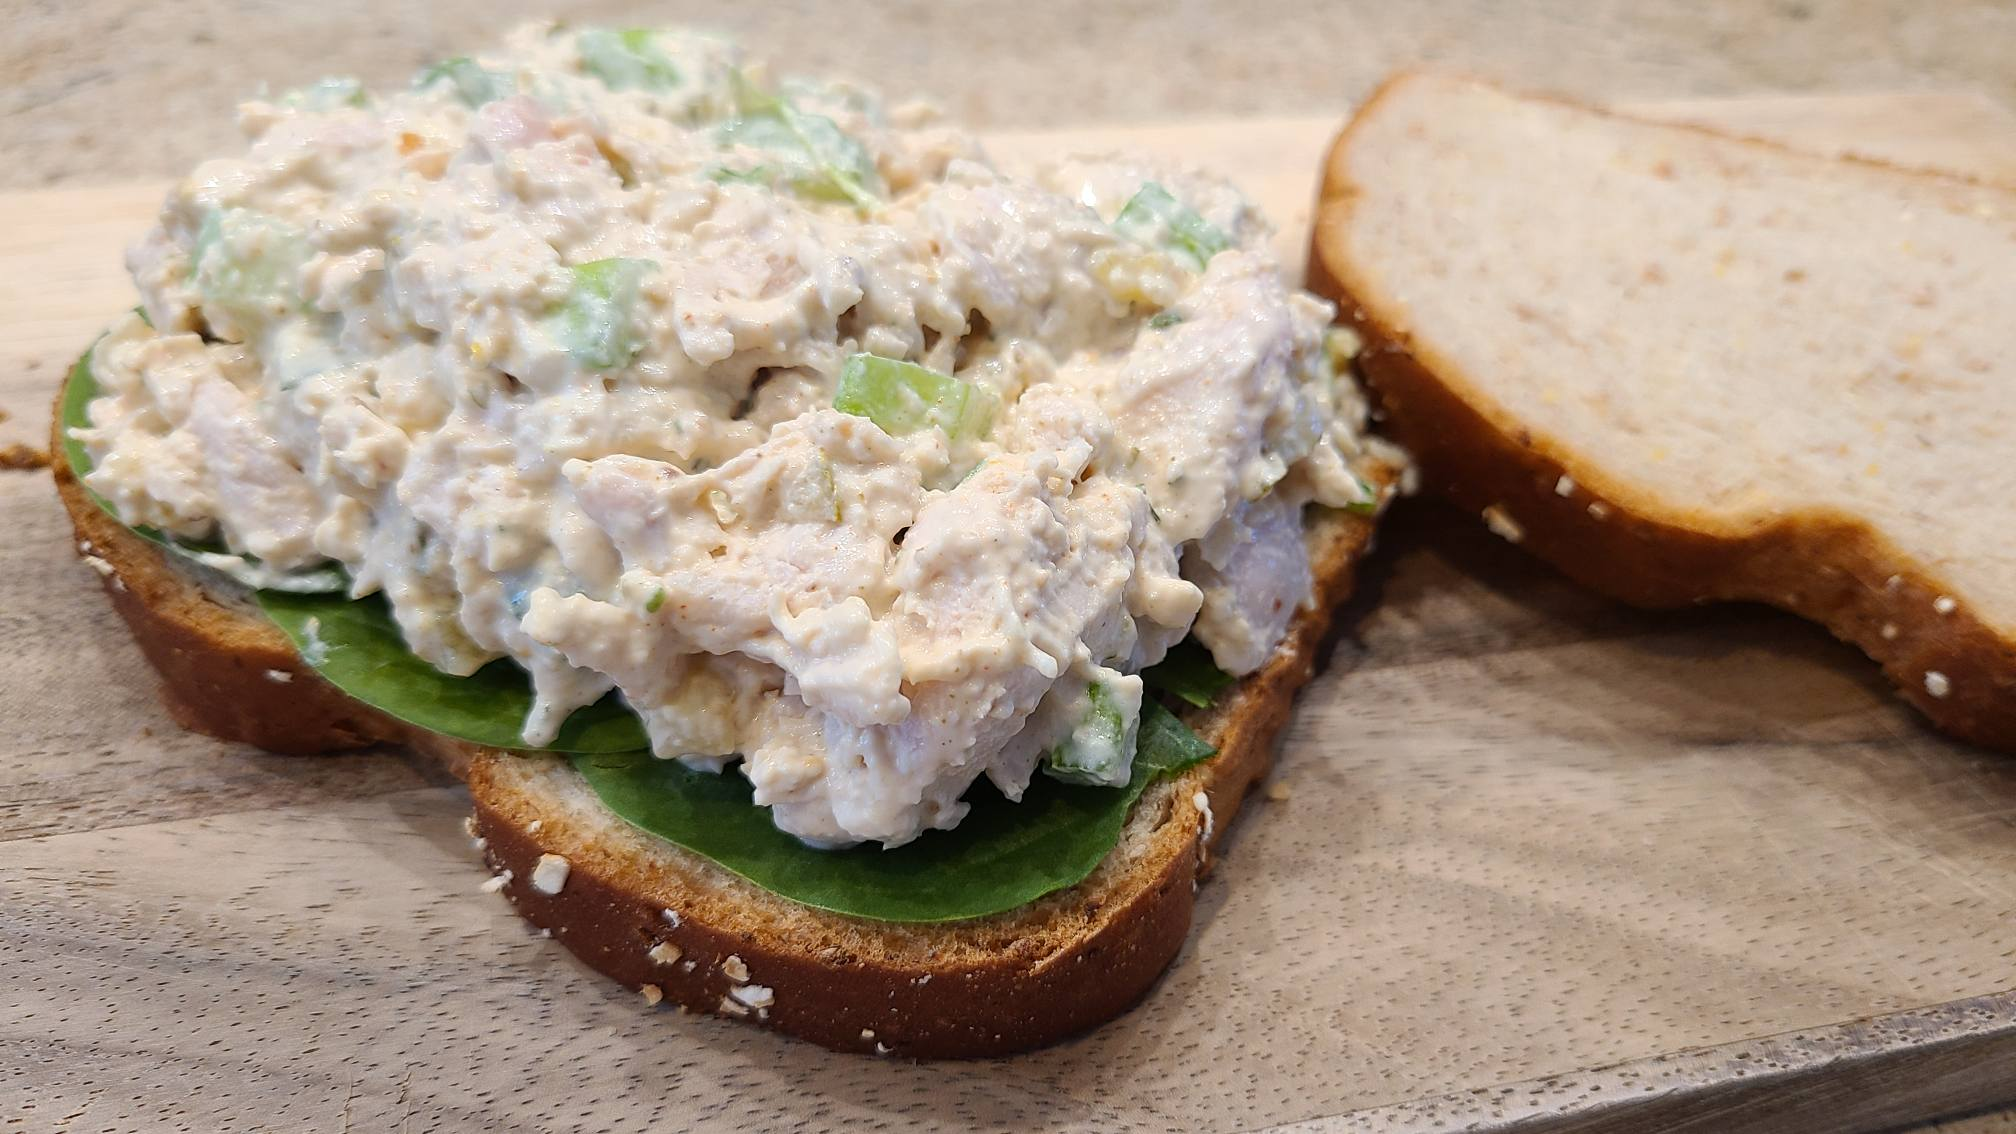 chicken salad sandwiches, ready to eat